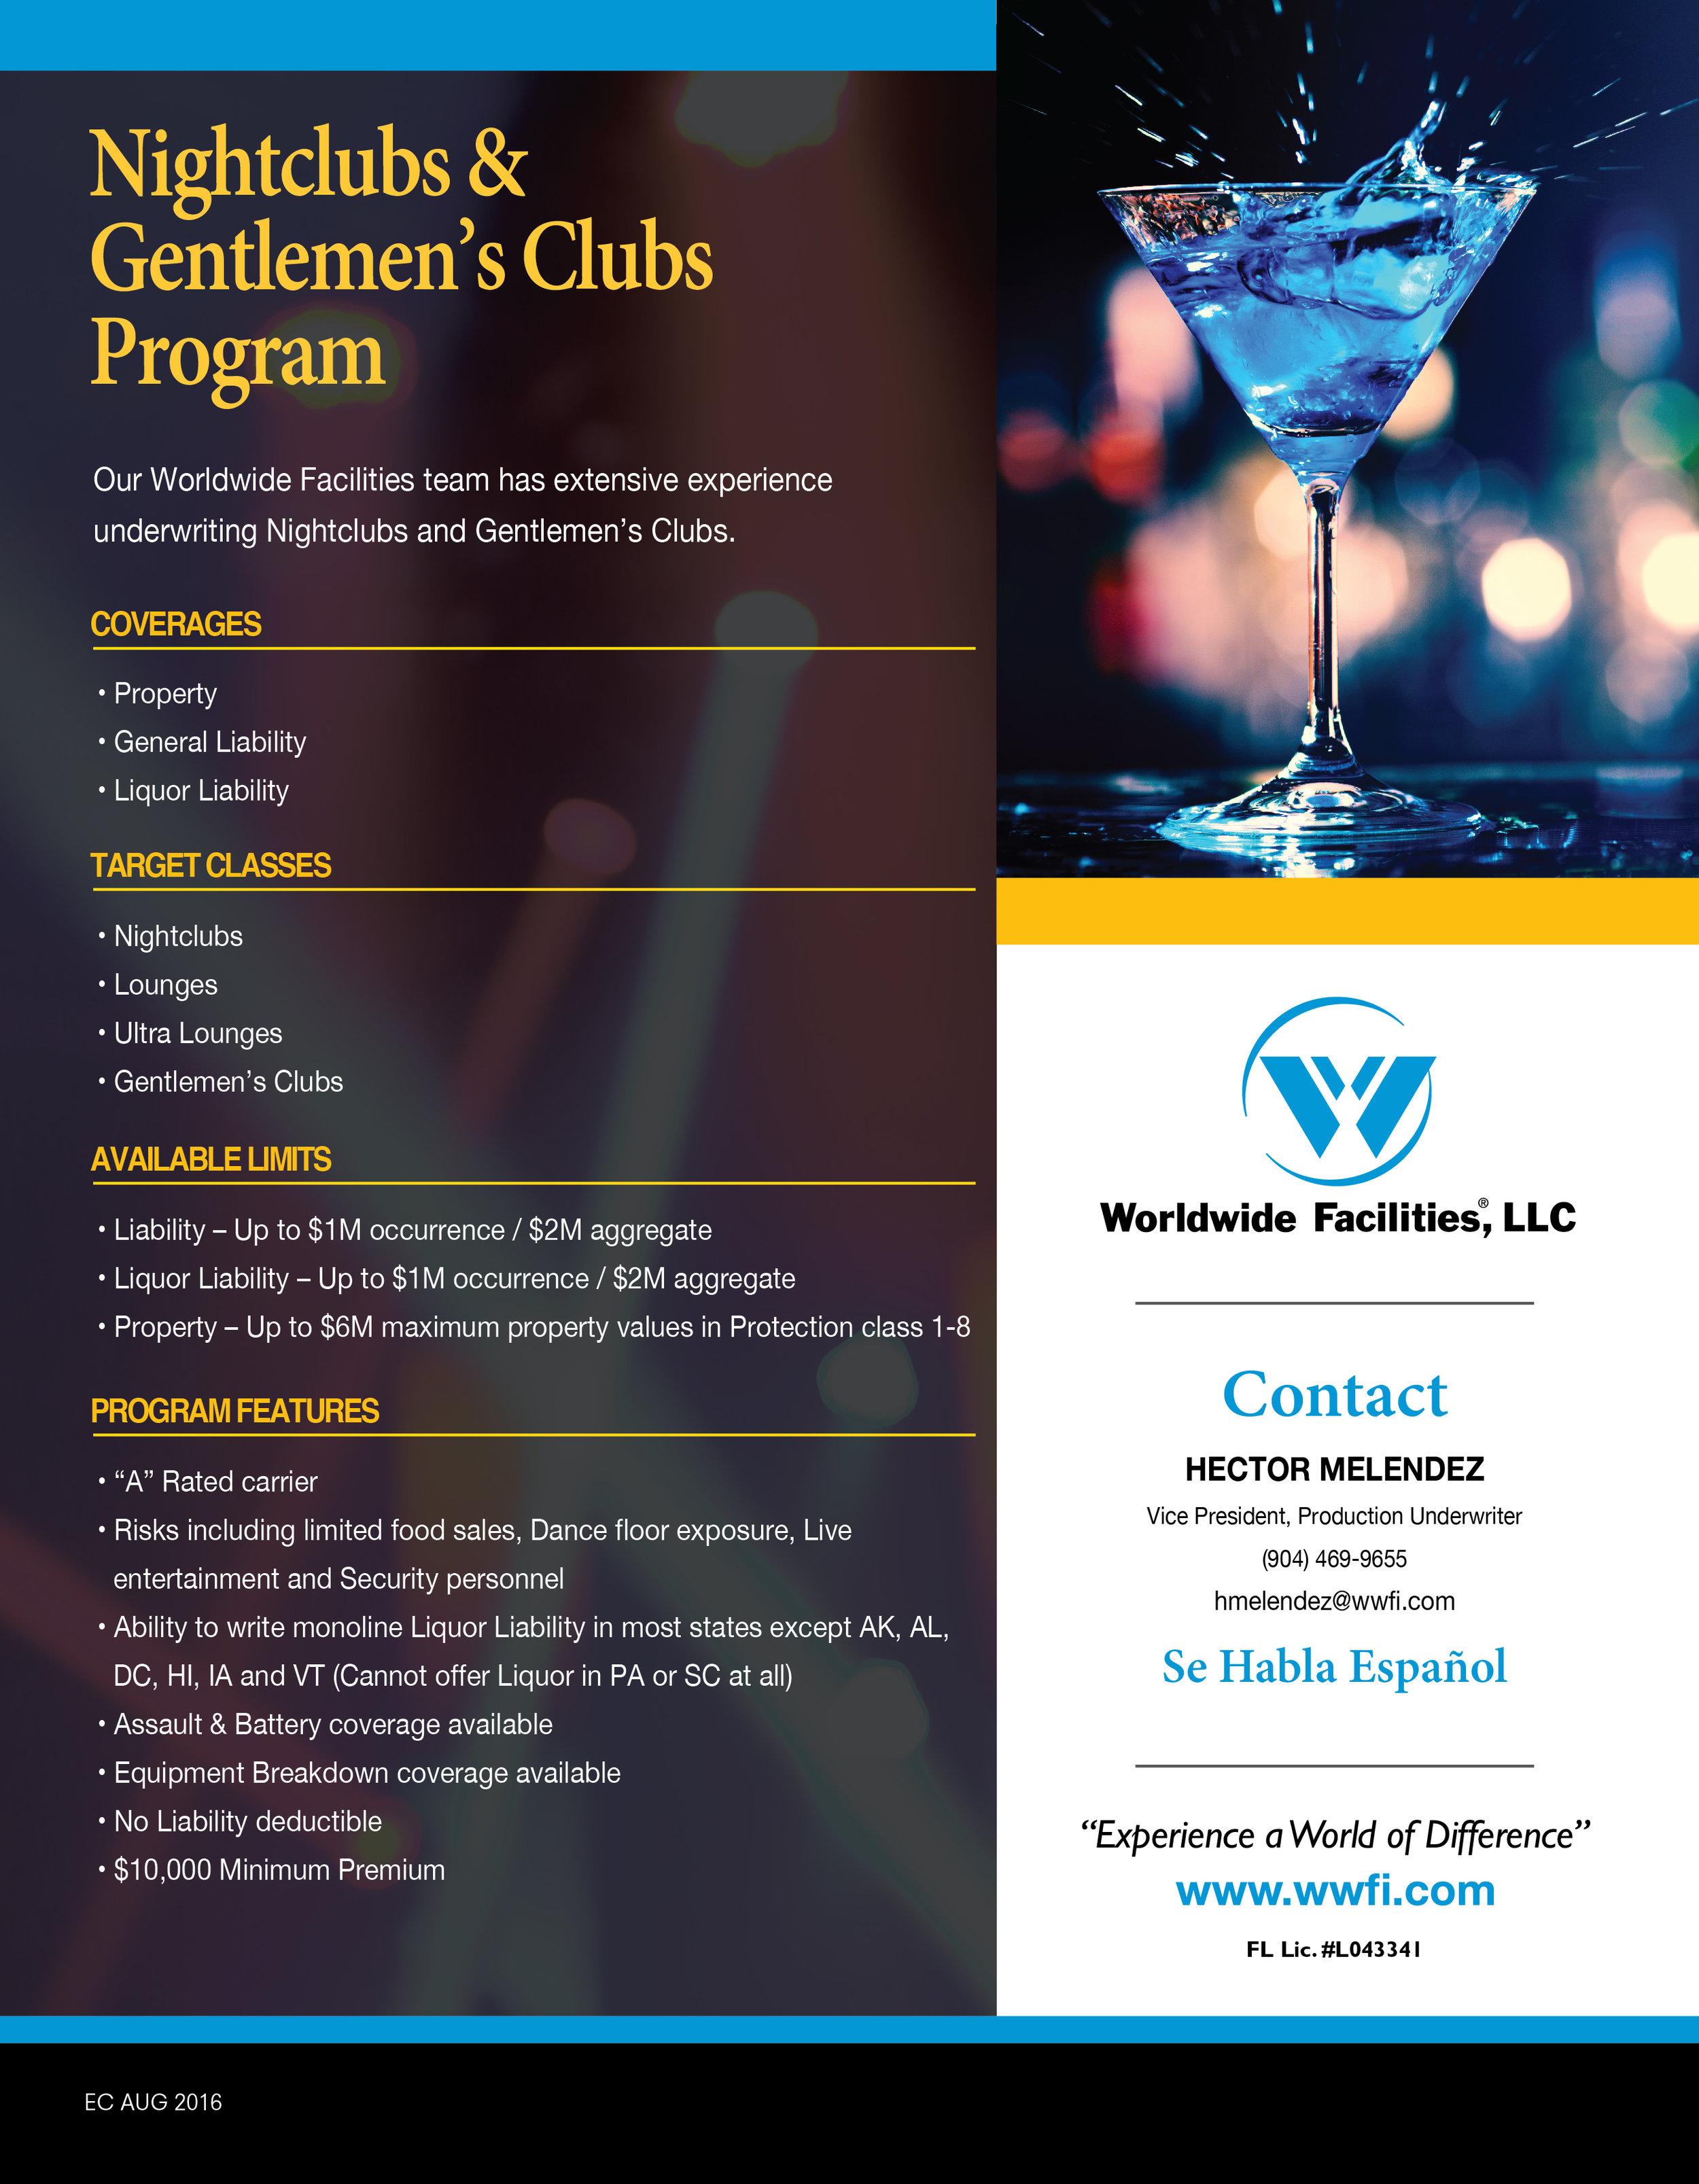 Flyer for Worldwide Facilities, LLC